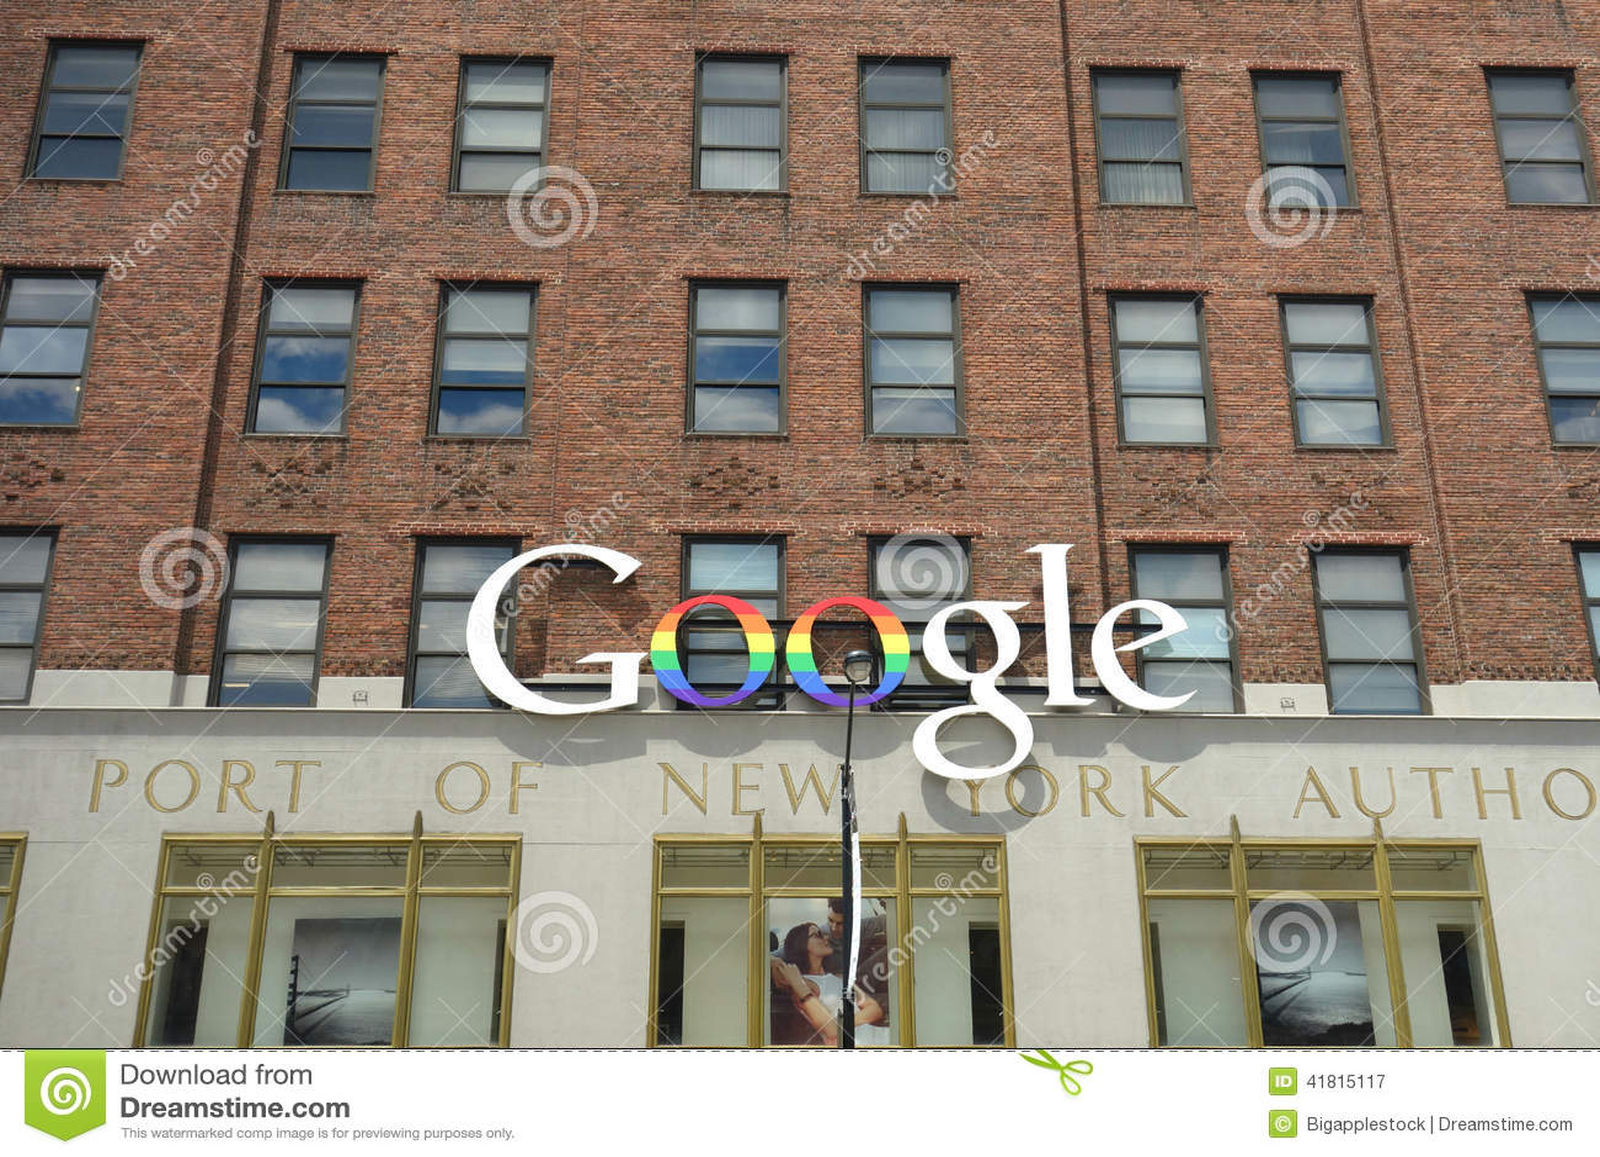 Google New York Offices